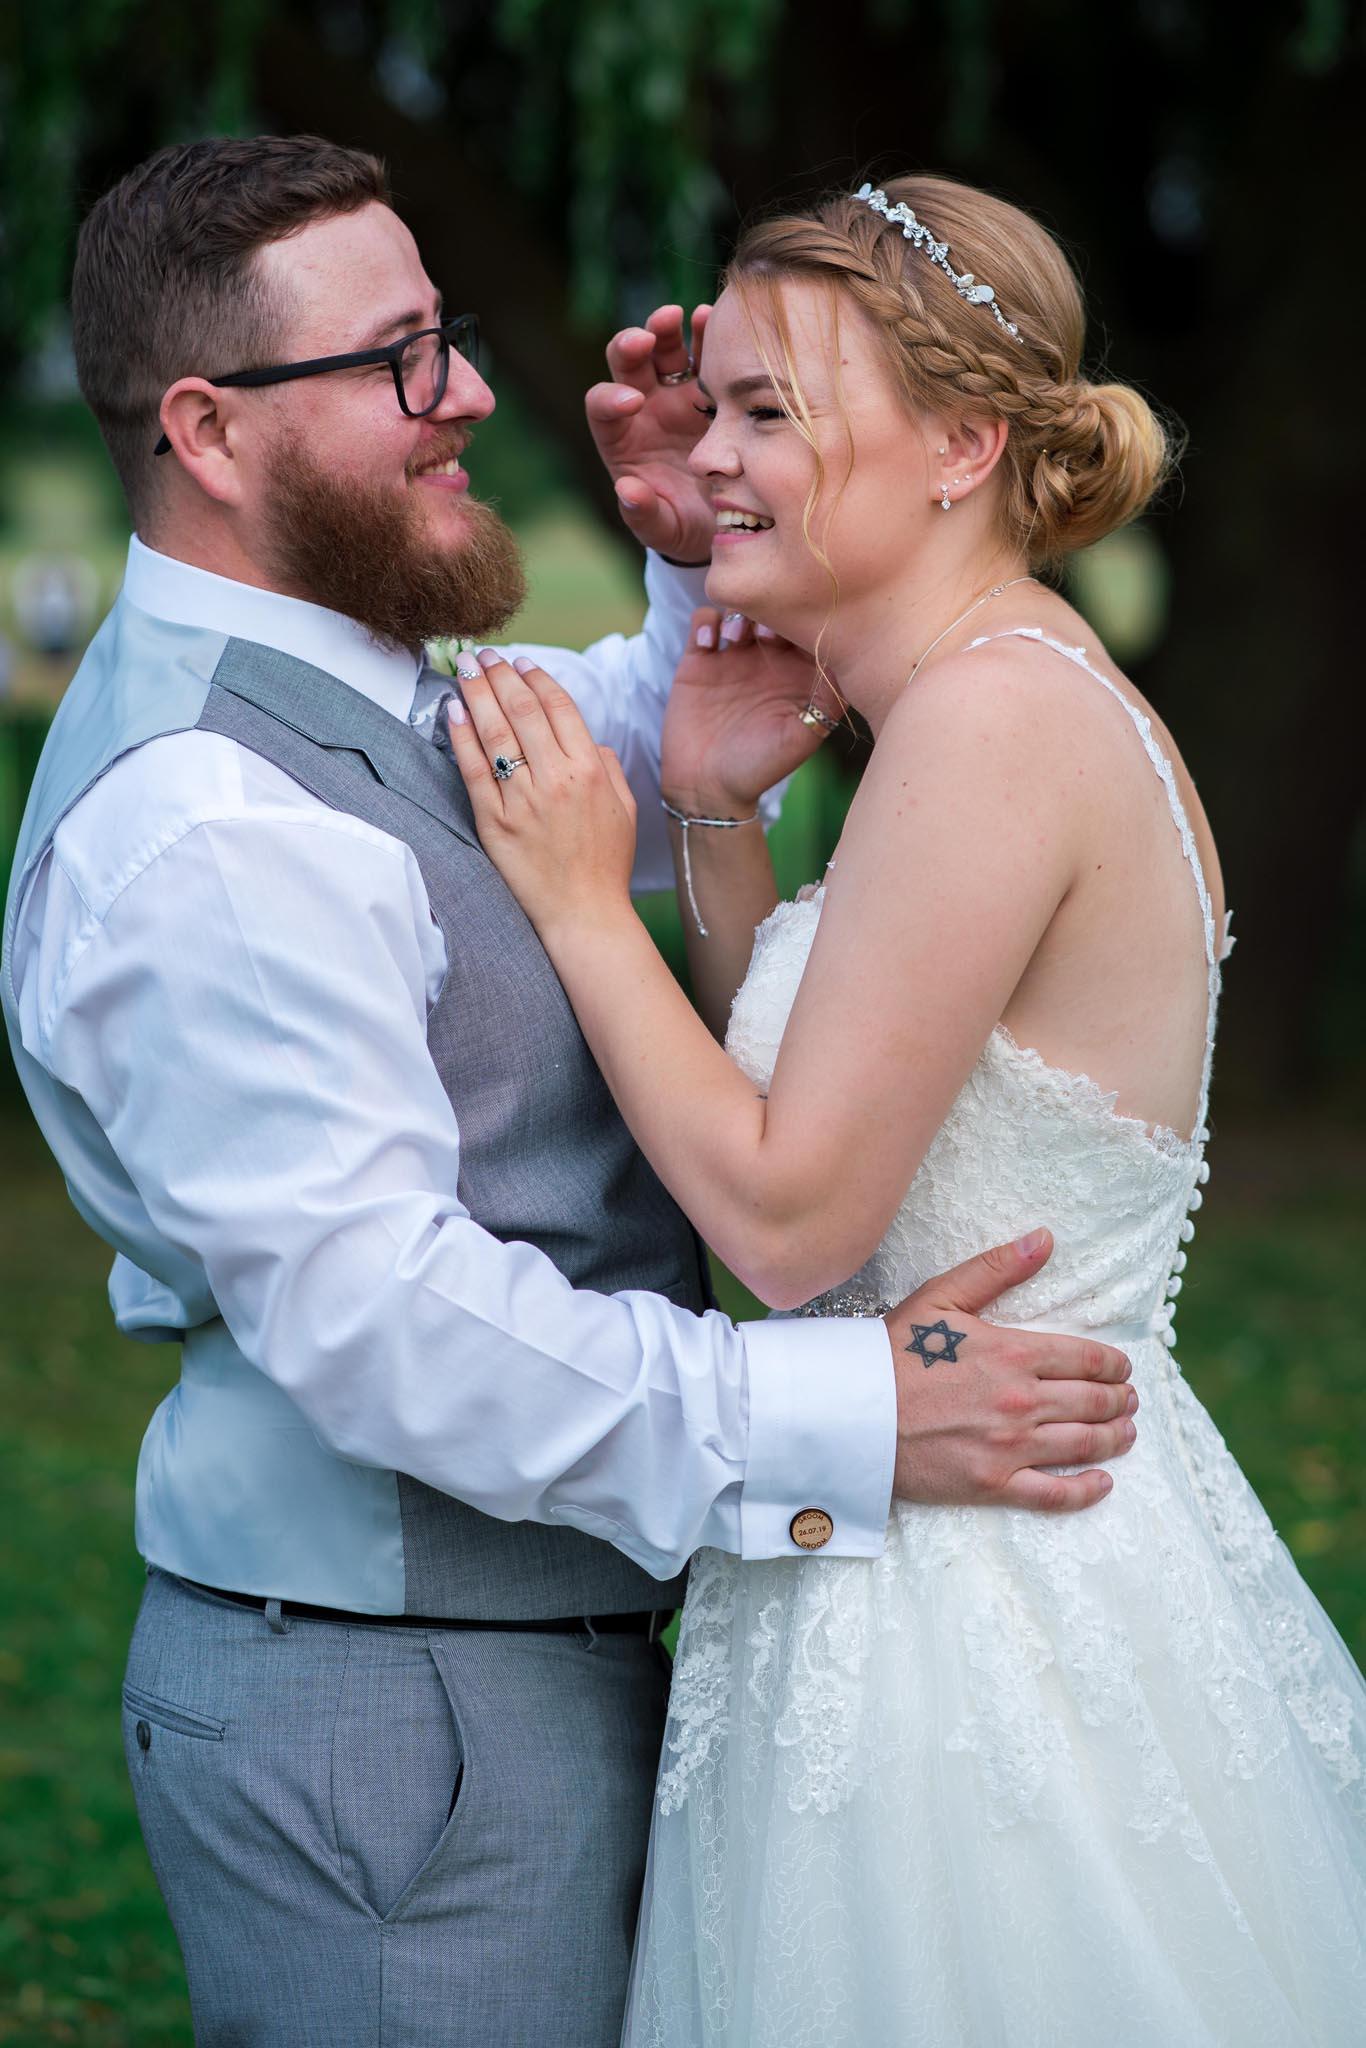 574-Bride-groom-Luke-Yasmin-The-Rayleigh-Club-Wedding-Photography.jpg